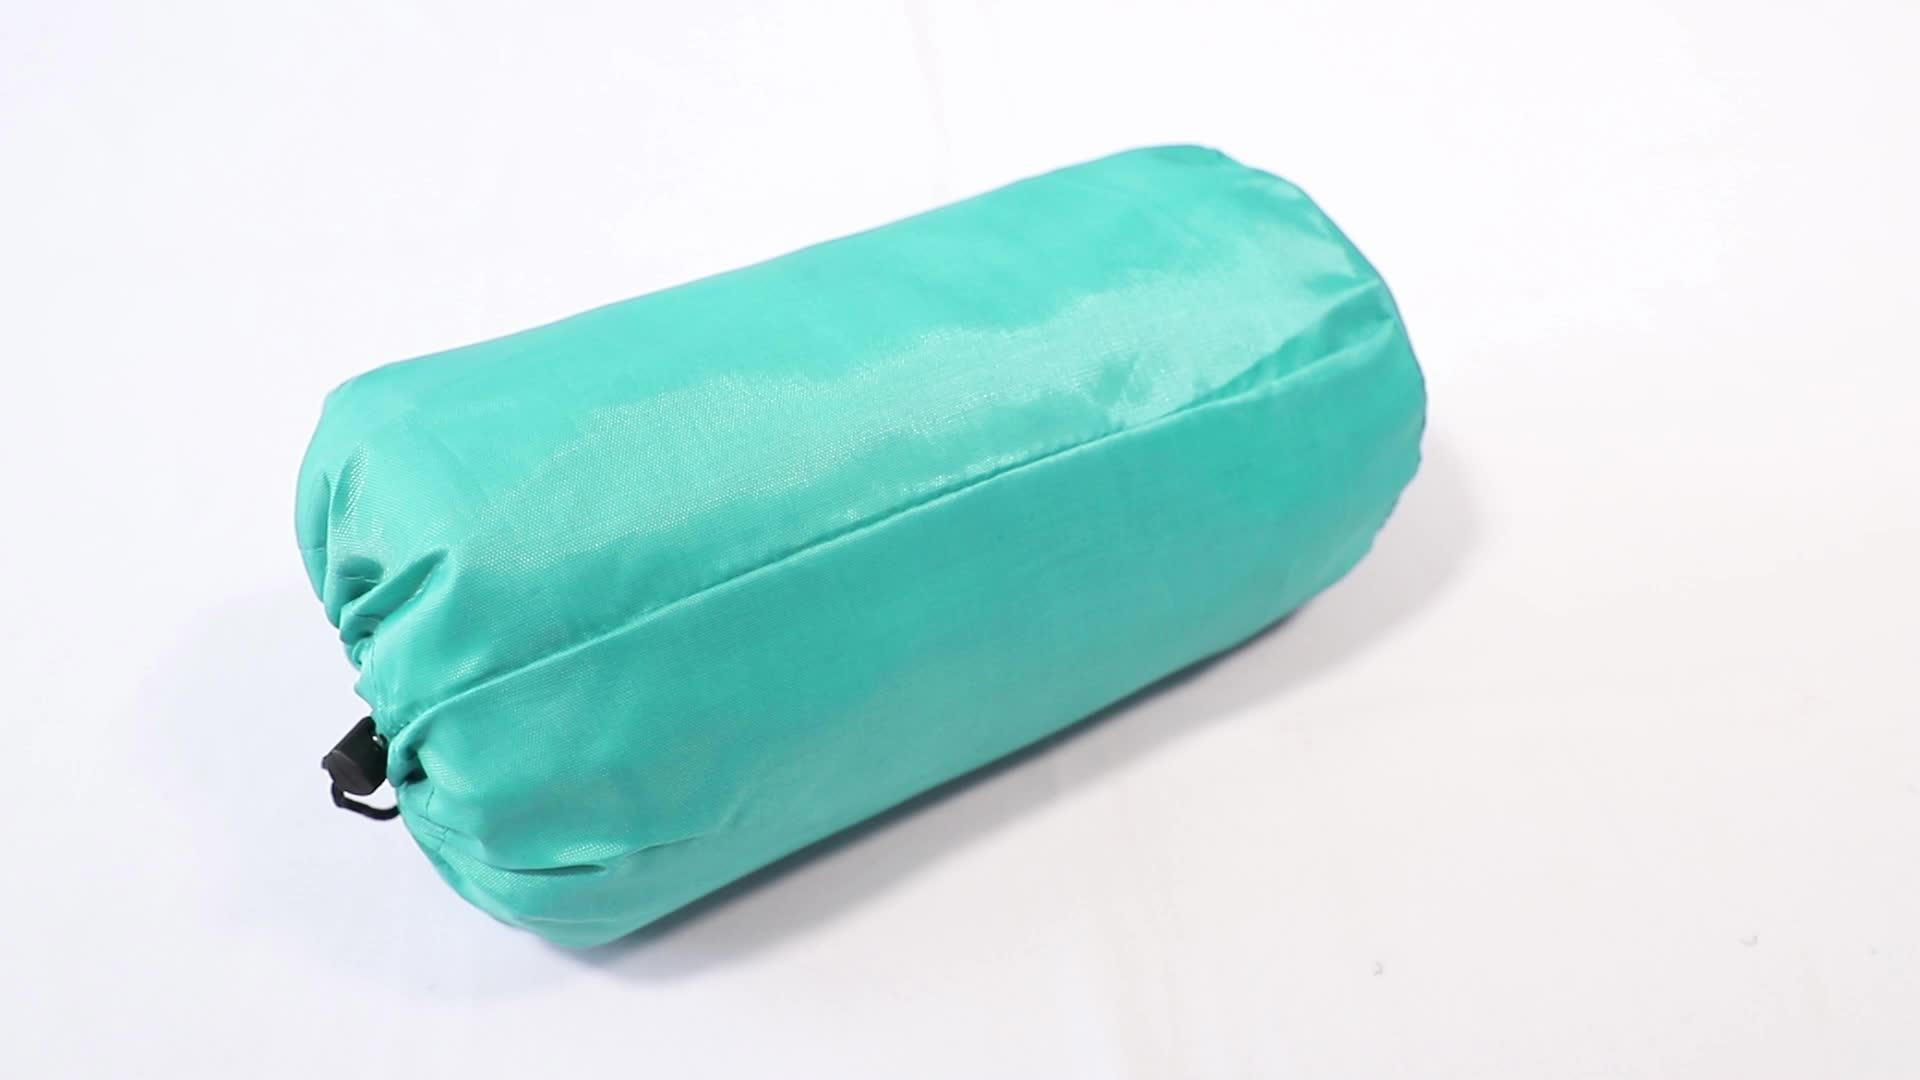 Bengku travel Inflatable hammock adult tpu insulated folding Sleeping bag air Pad foldable Ultra Light Camping Mat Mattress